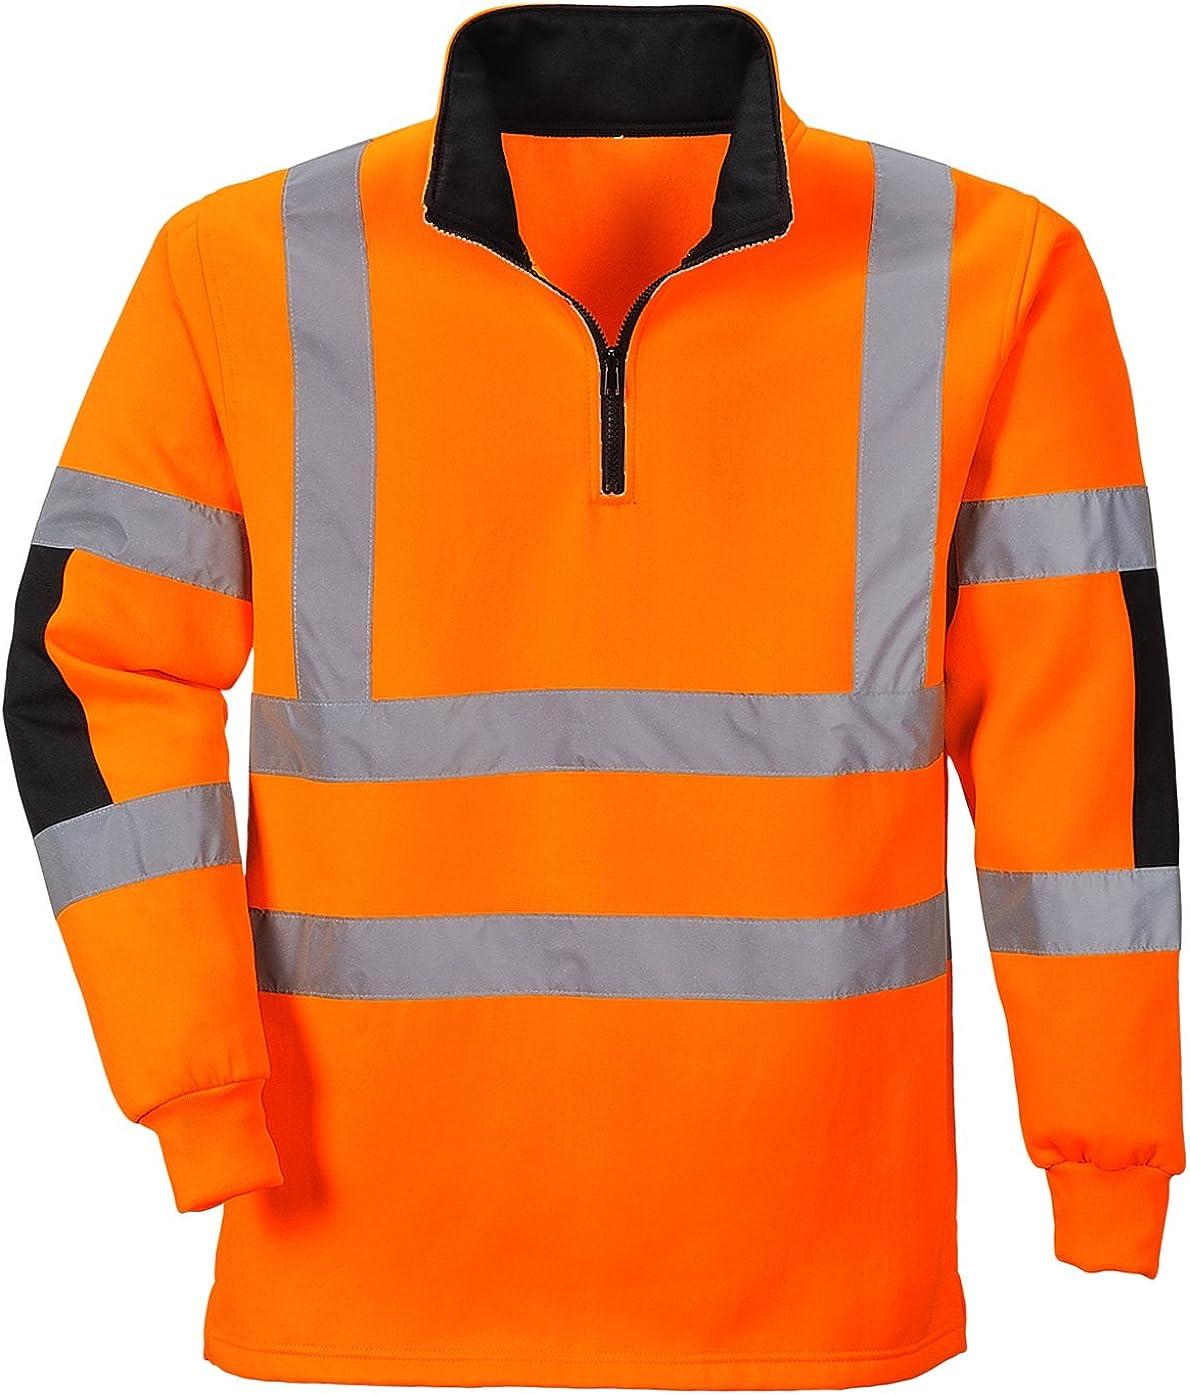 B308 Portwest Xenon Hi Vis Rugby Sweatshirt